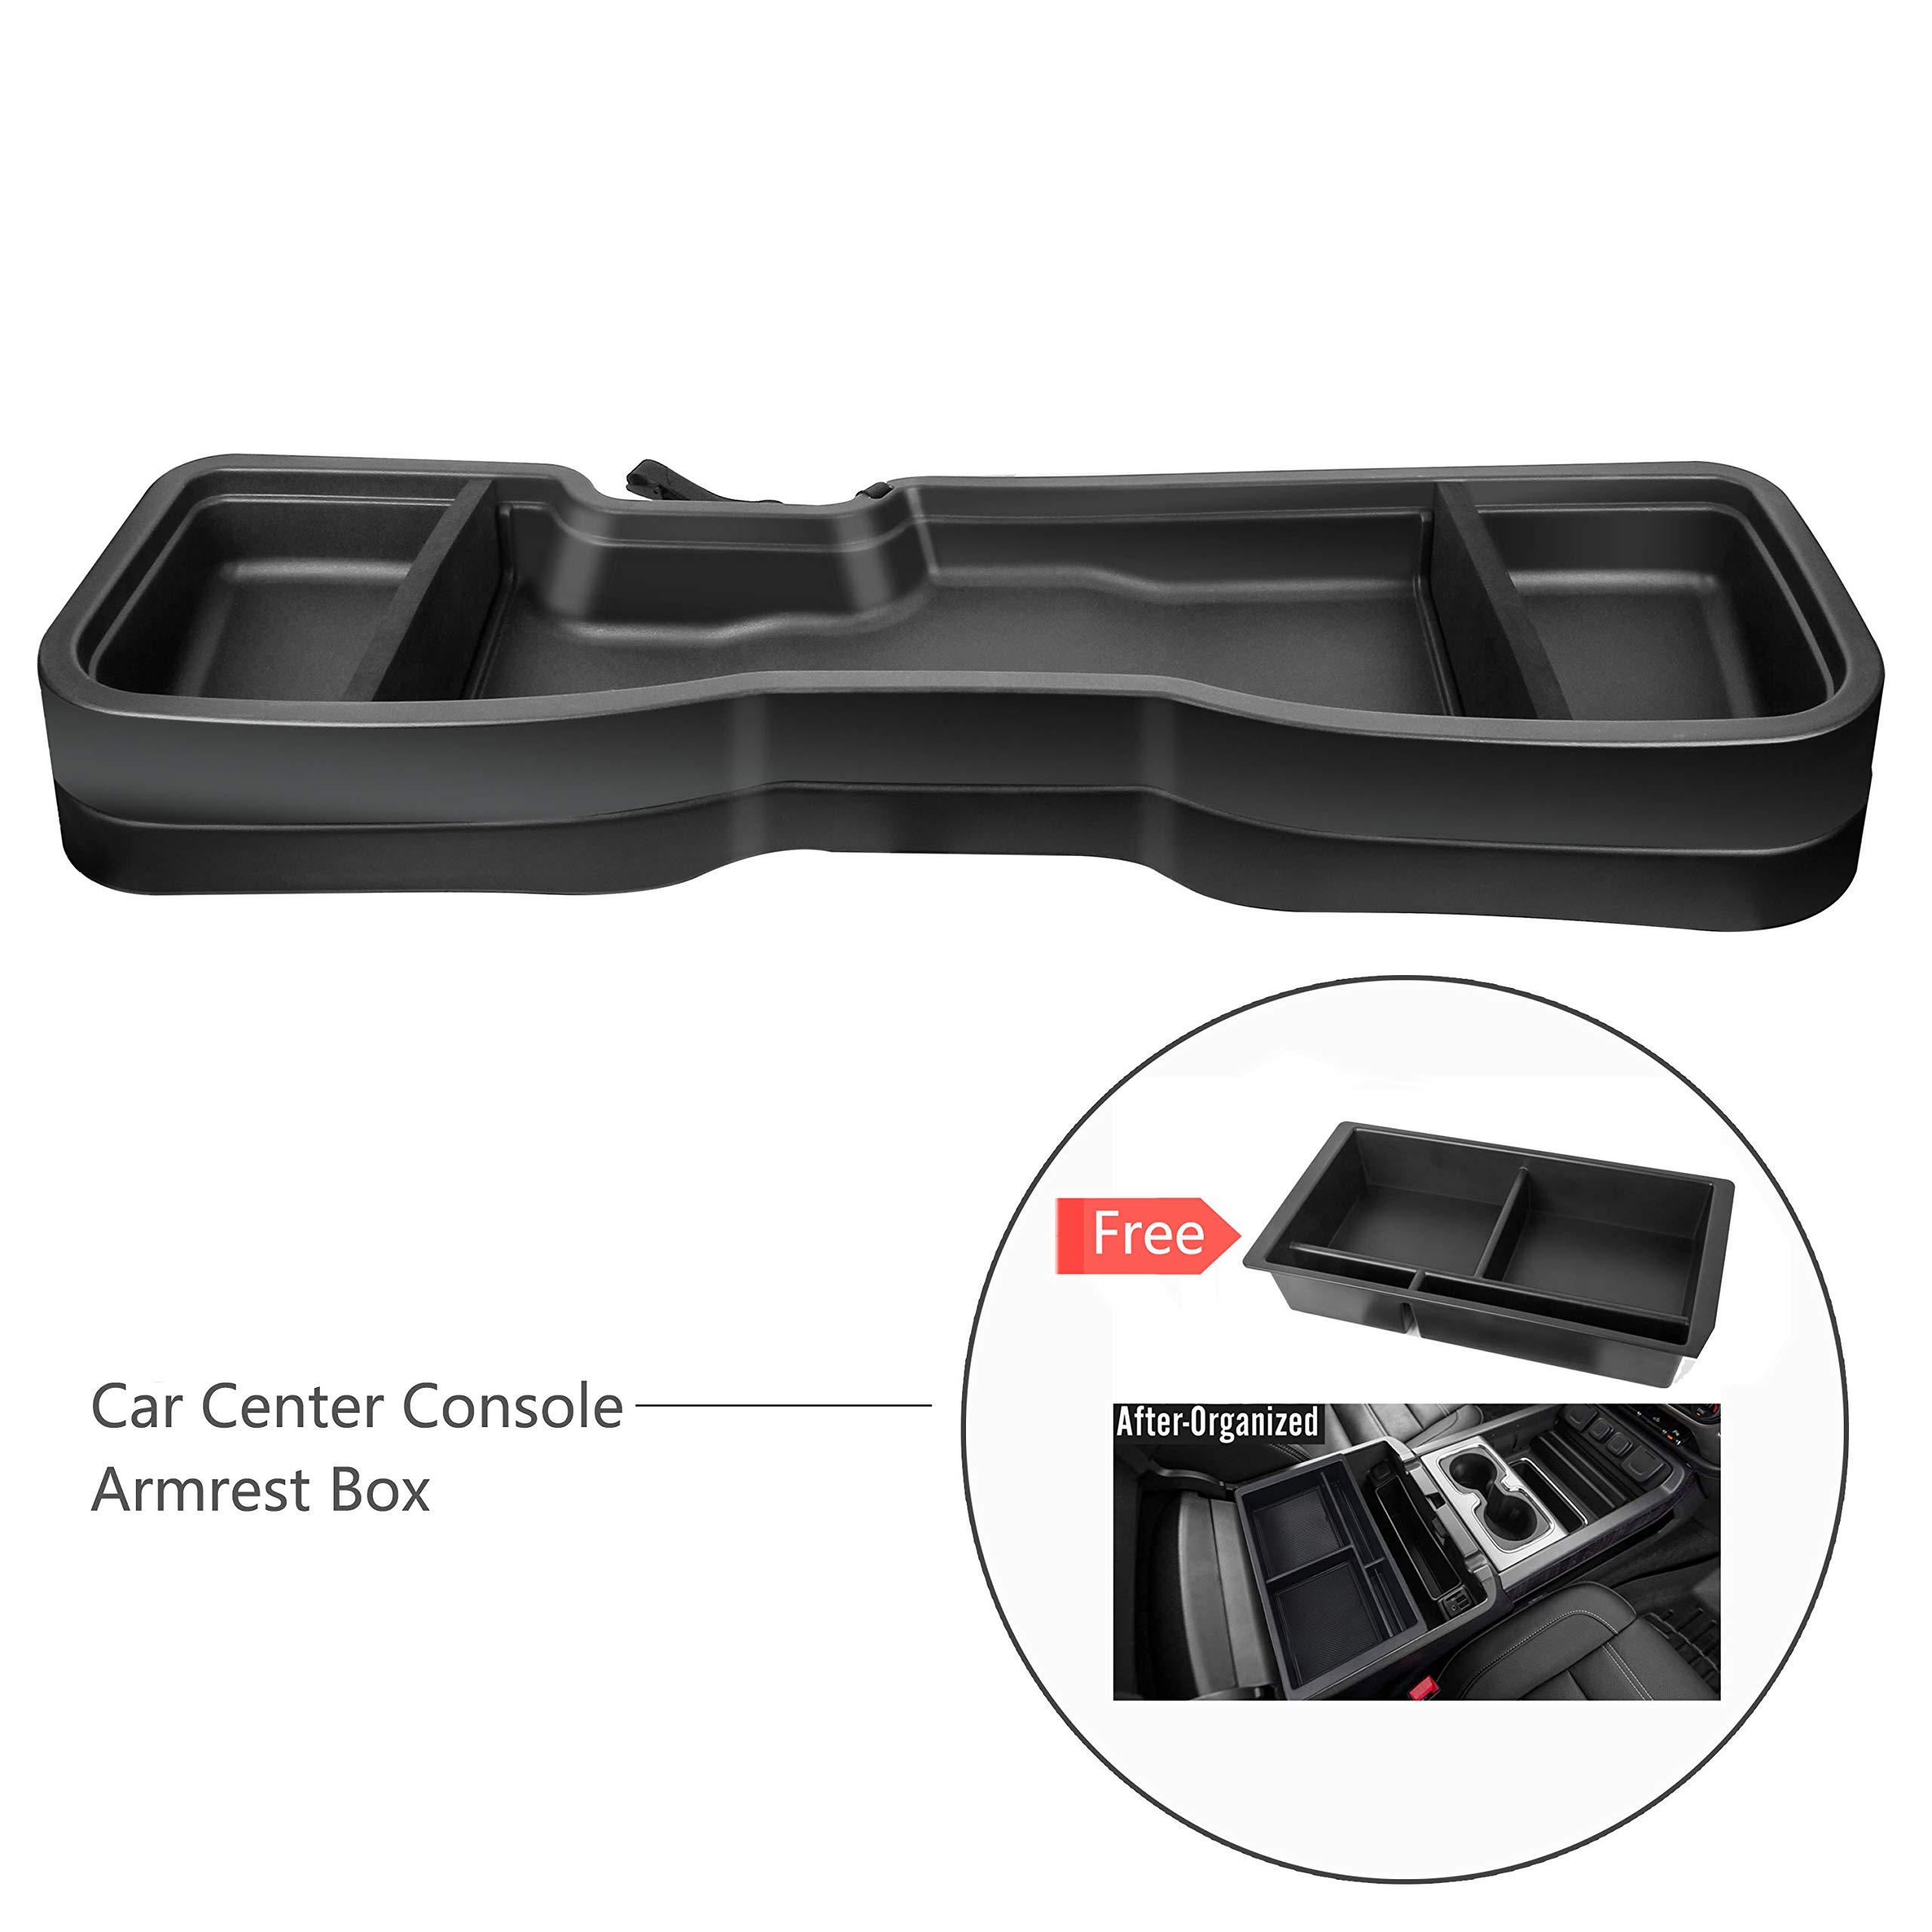 Amooca Gearbox Under Seat Storage Box Compatible for 2014-2018 Chevrolet-GMC Silverado/Sierra 1500 for 2015-2019 Chevrolet-GMC Silverado/Sierra 2500/3500 Crew Cab Black by Amooca